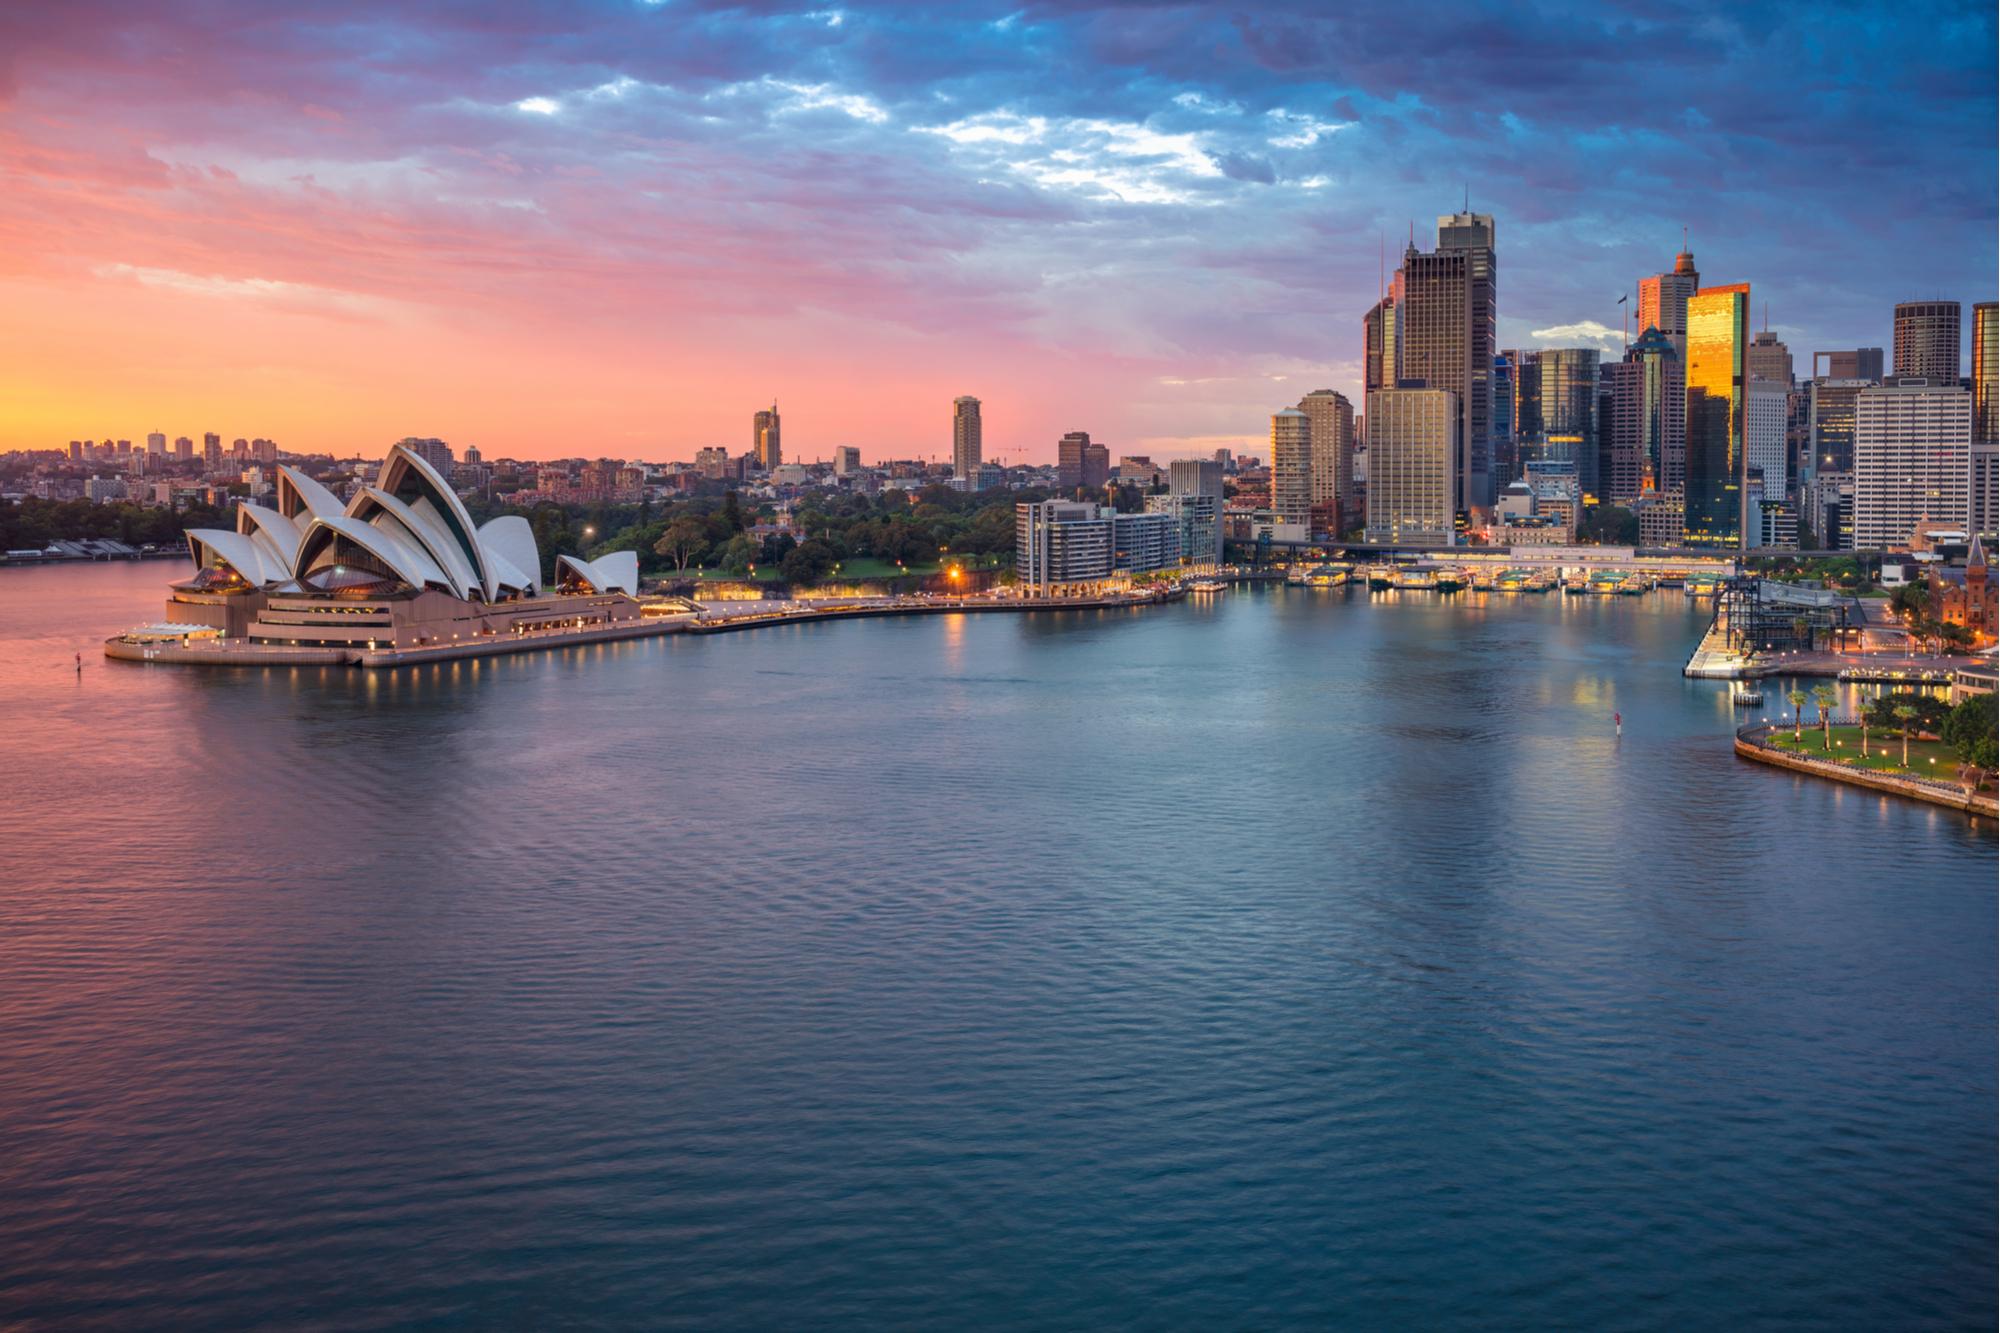 MedReleaf's Australian partner receives production license,fueling company's global expansion